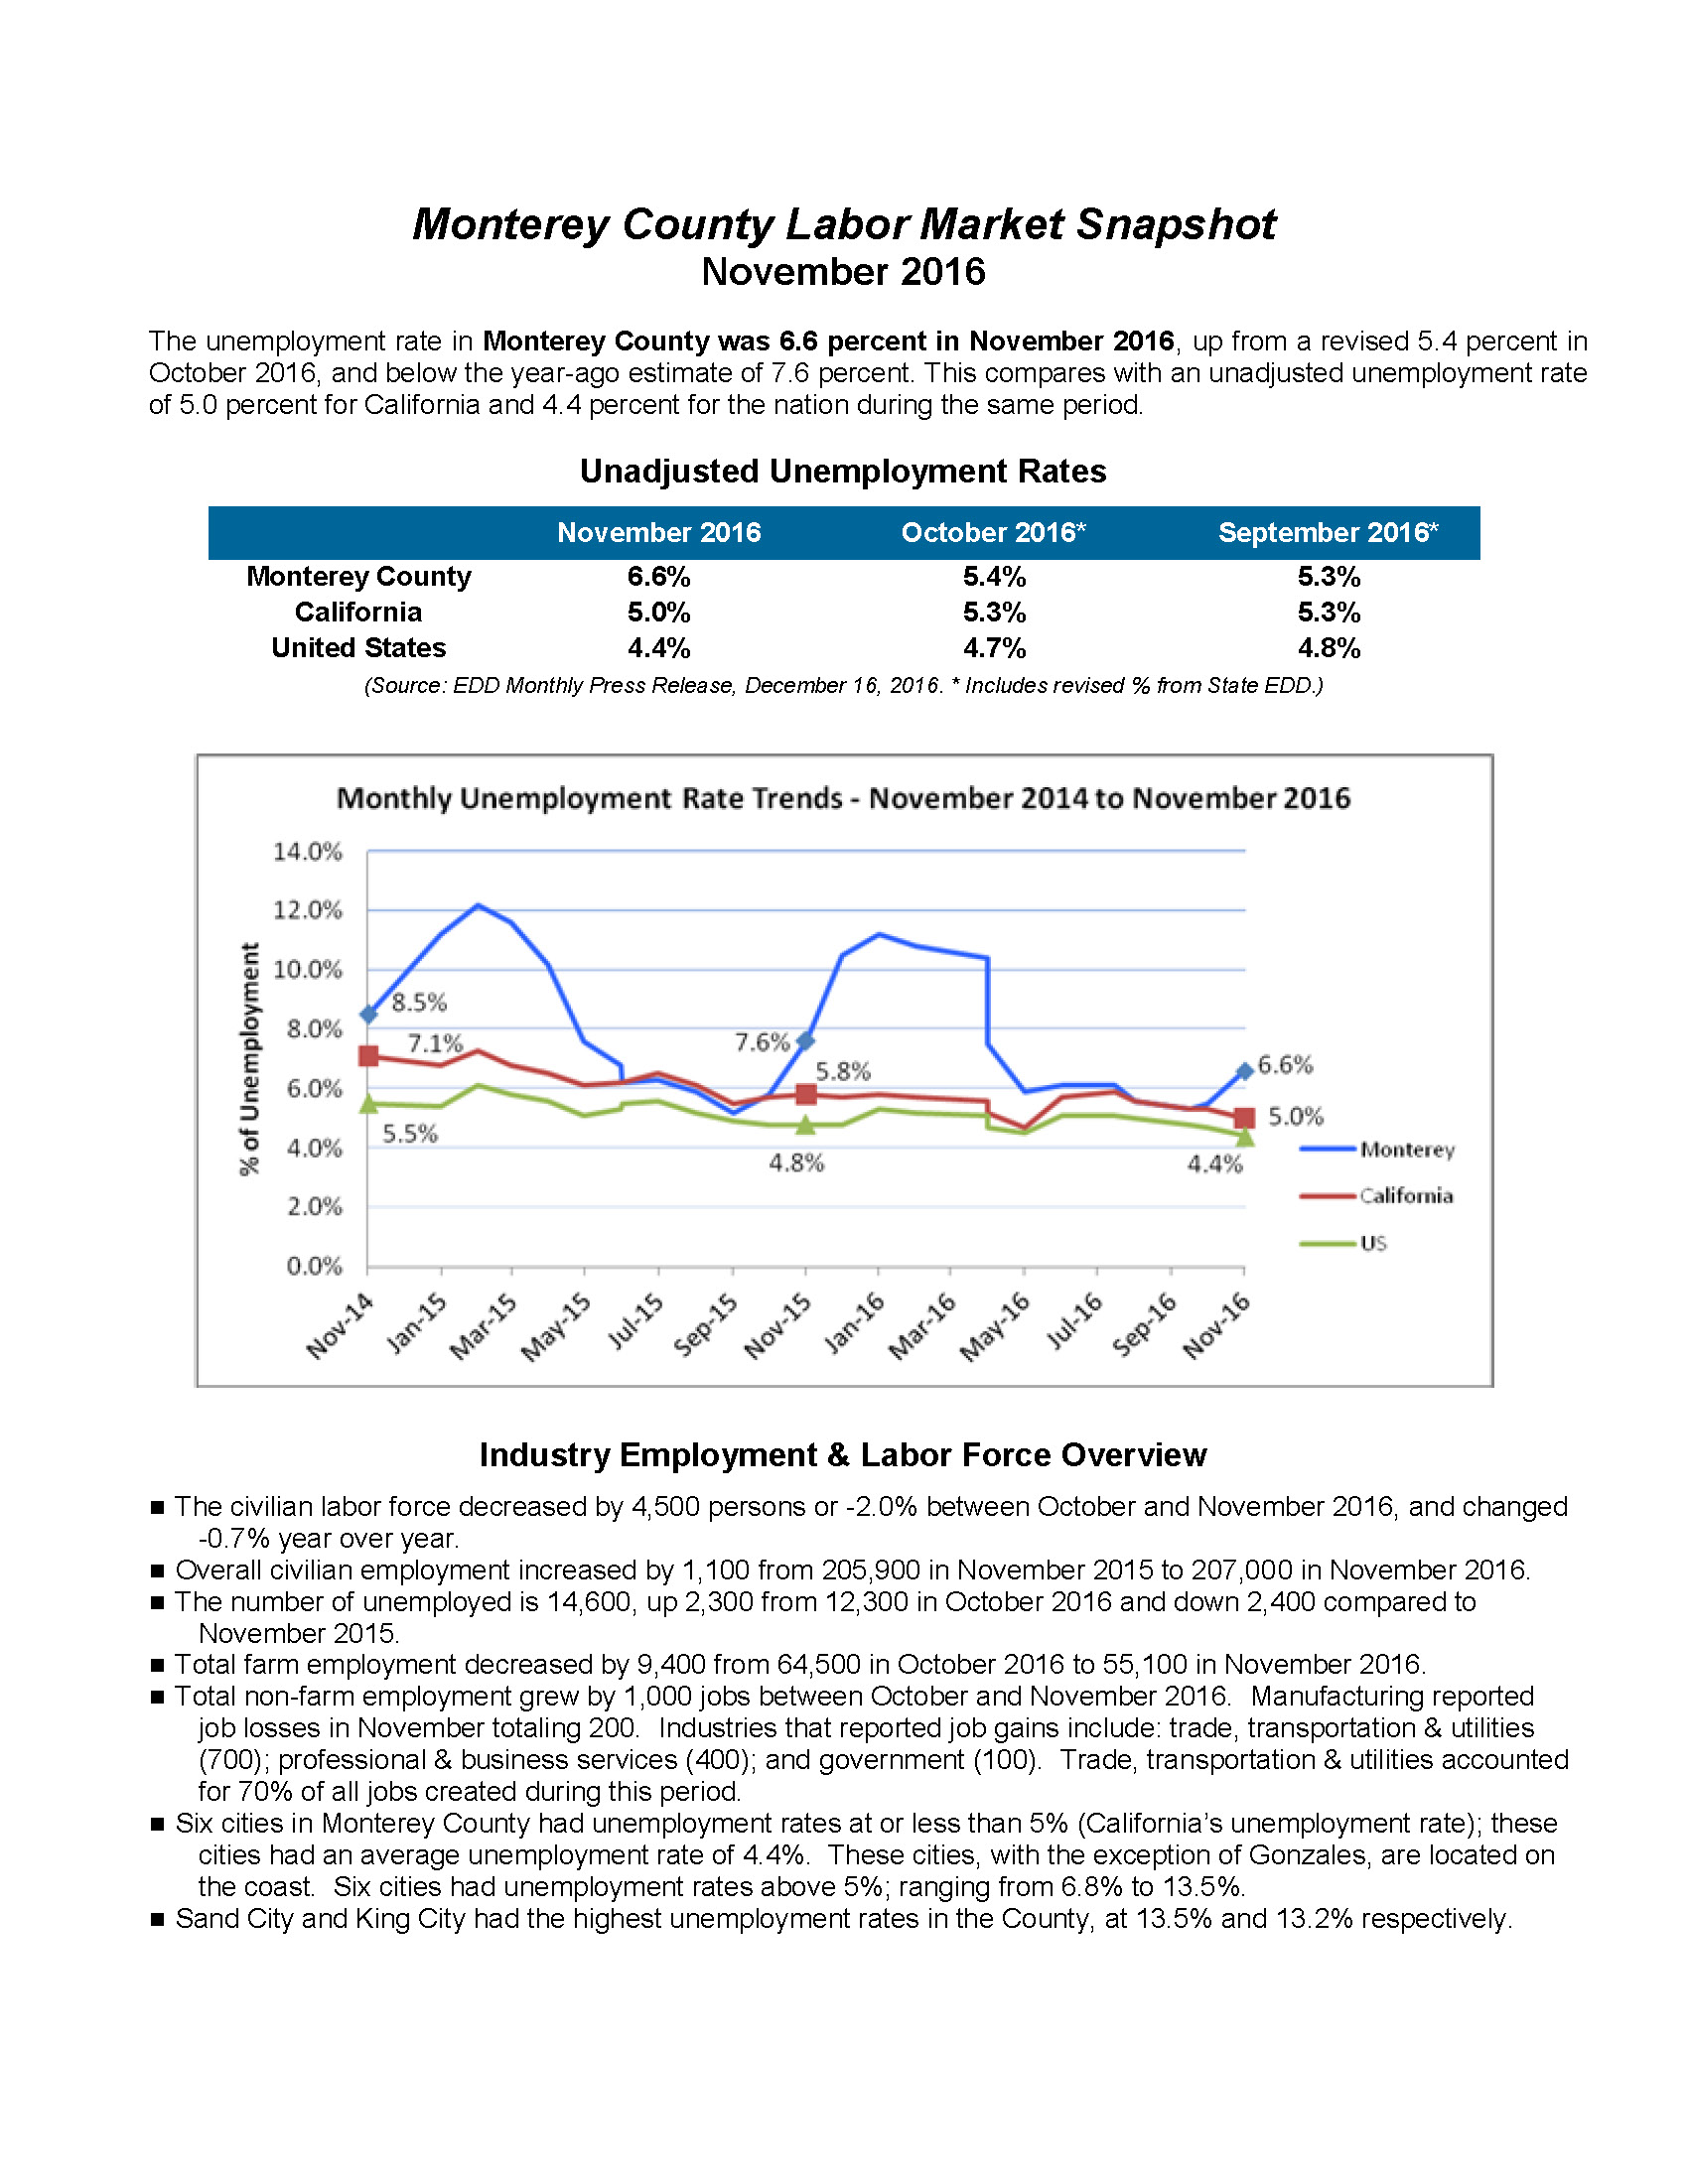 Monterey County Labor Market Snapshot 1